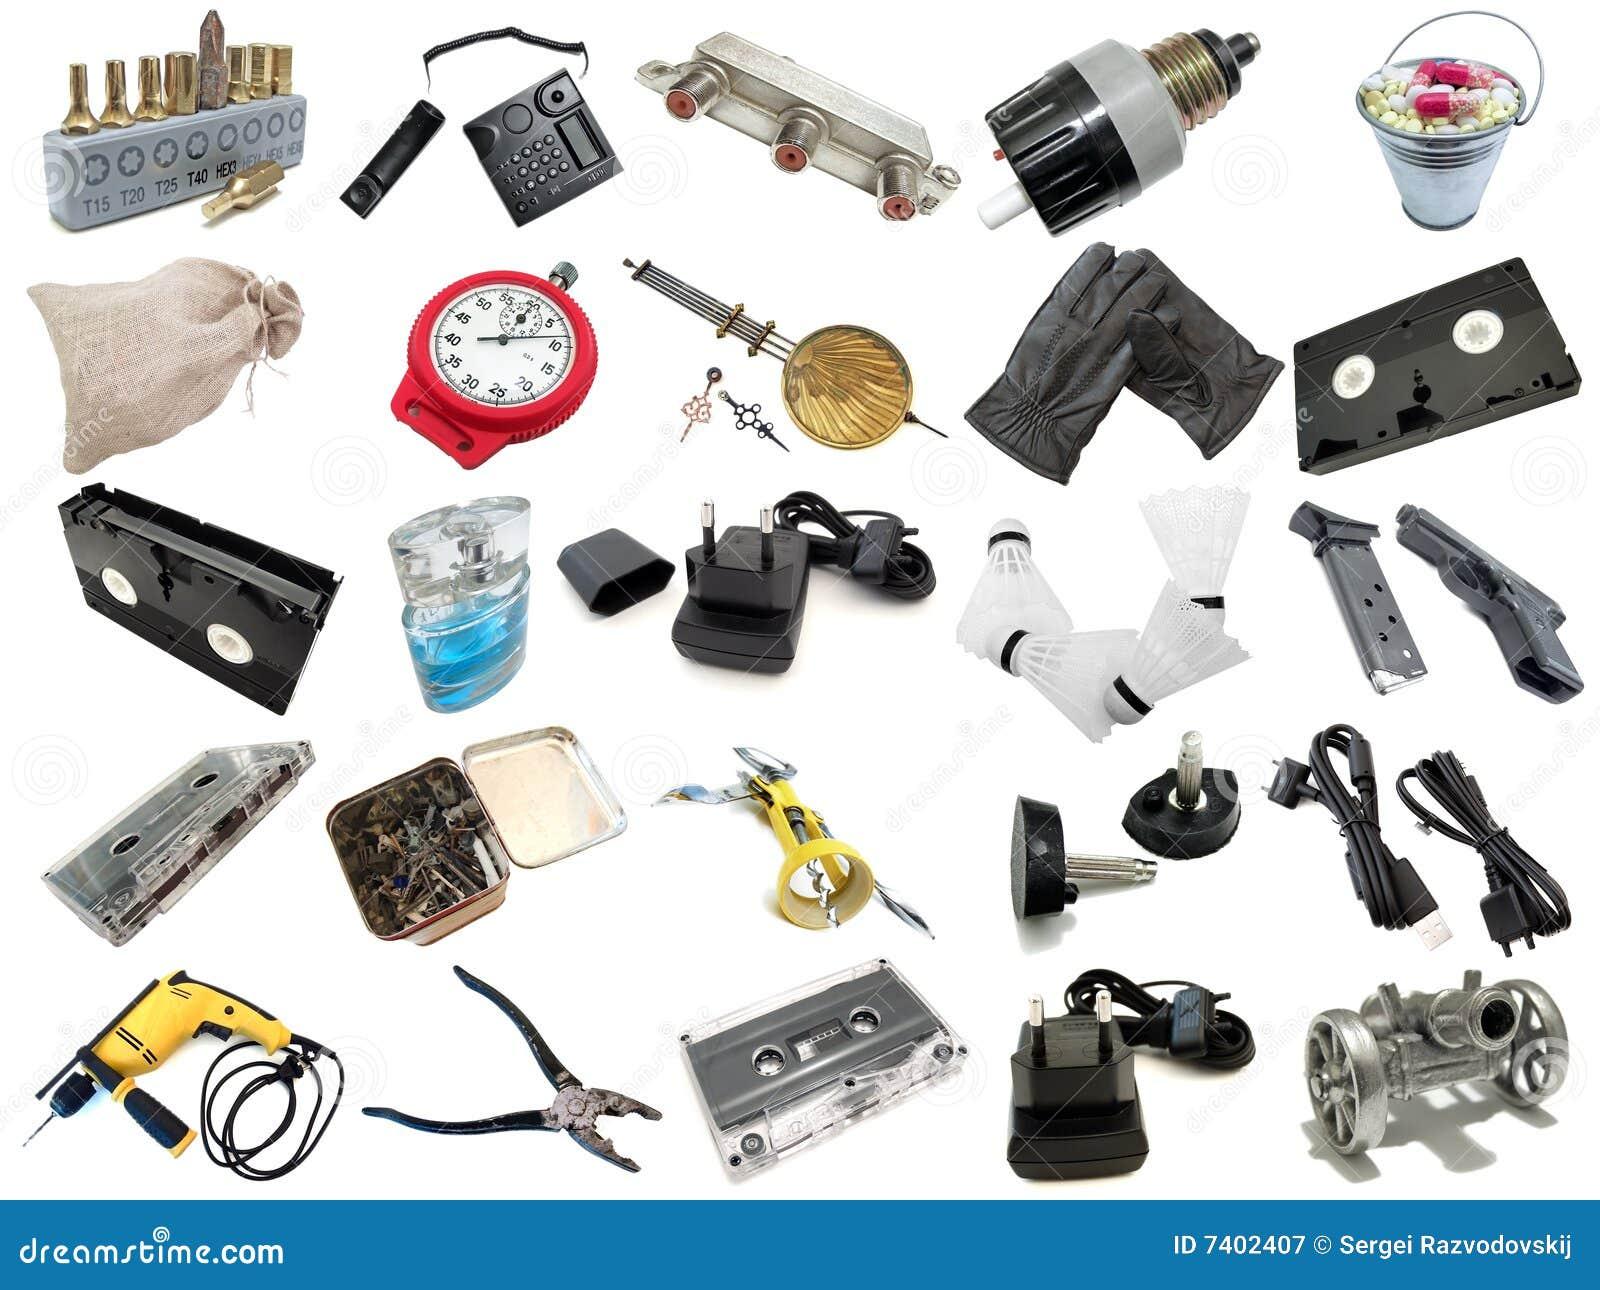 Everyday Items That Need Improvement